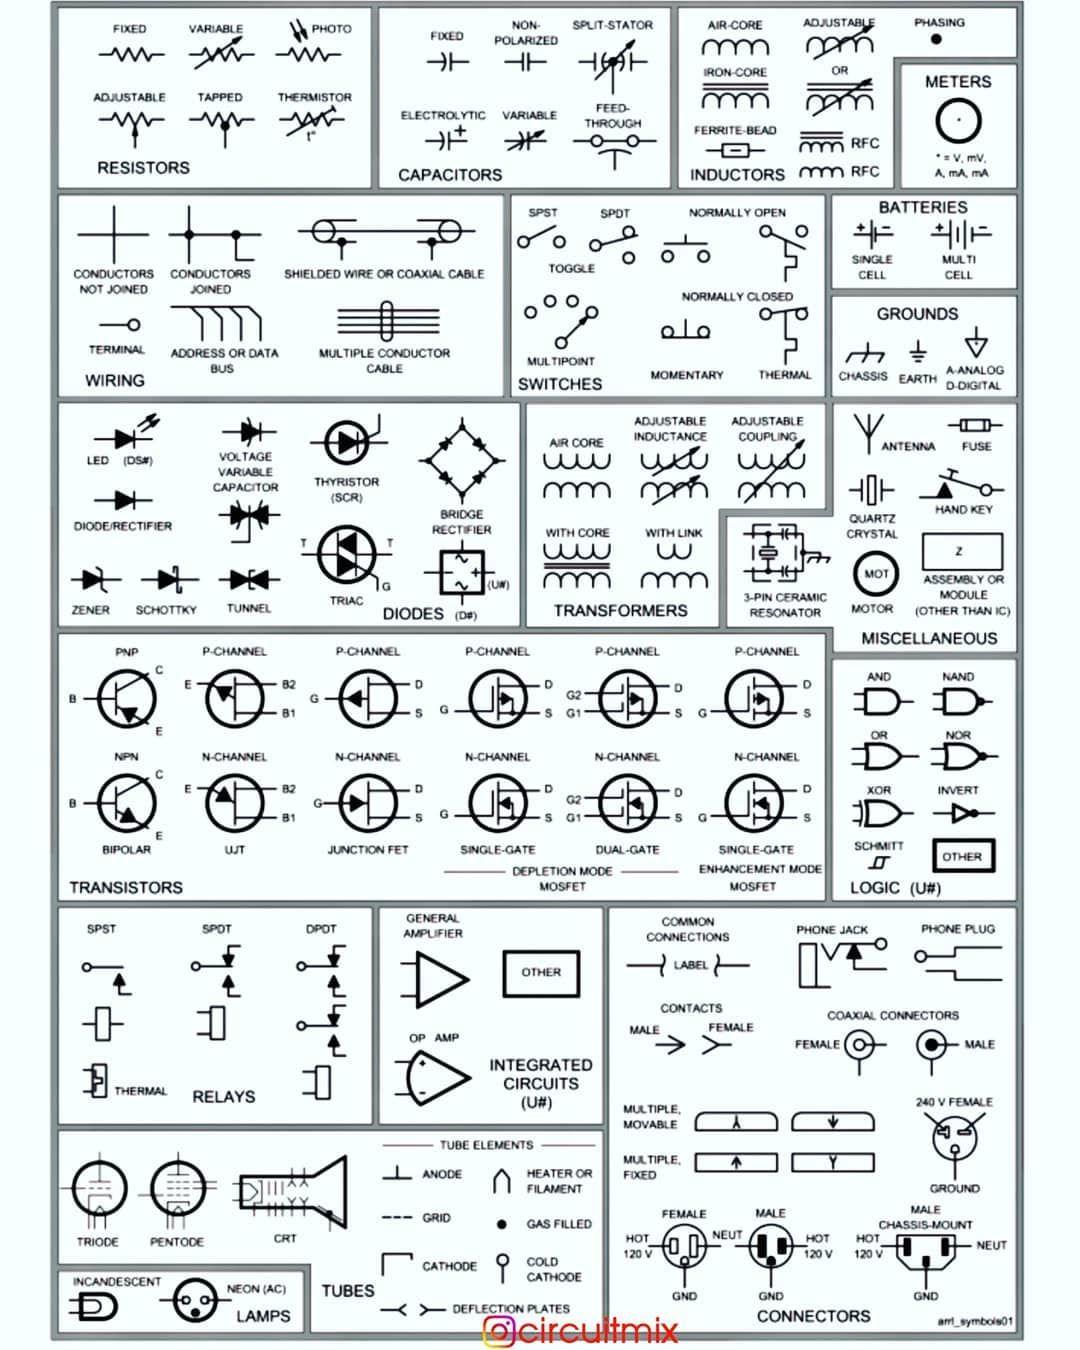 Circuitmix Circuitmix En Instagram Useful